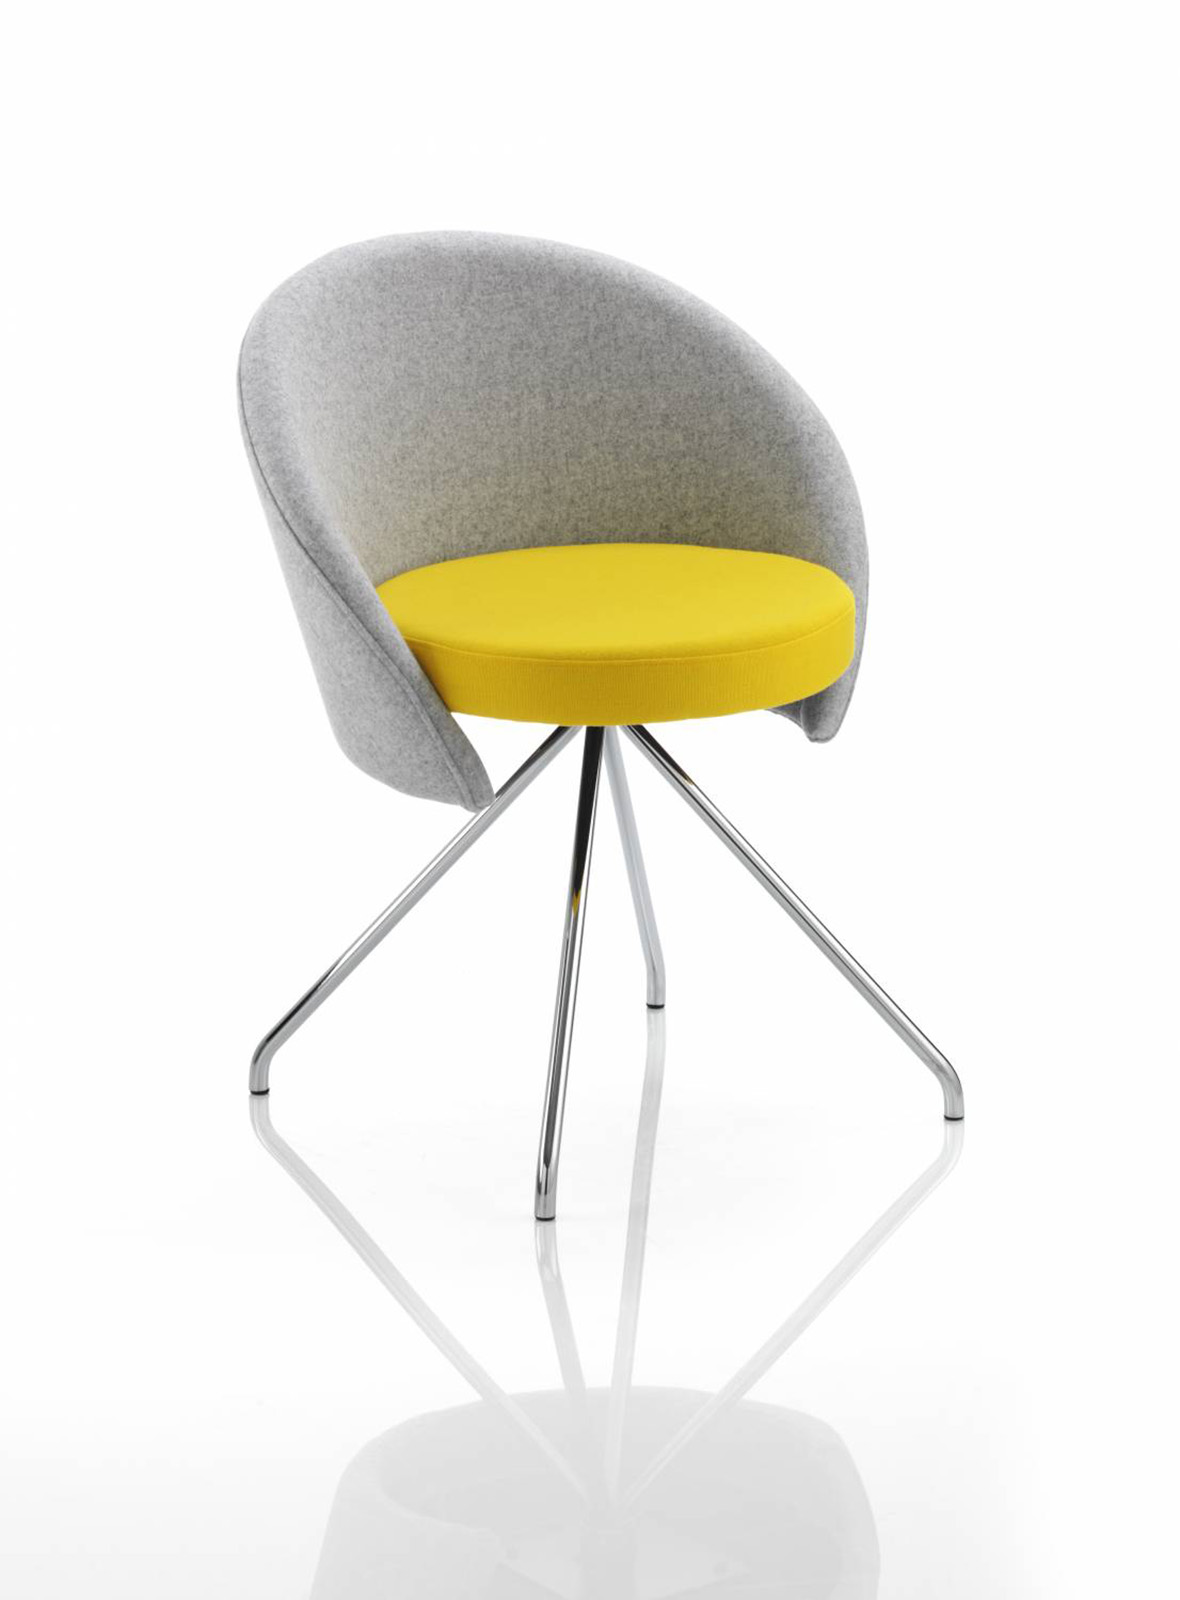 swivel chair, yellow swivel chair, upholstered swivel chair, chrome spider base